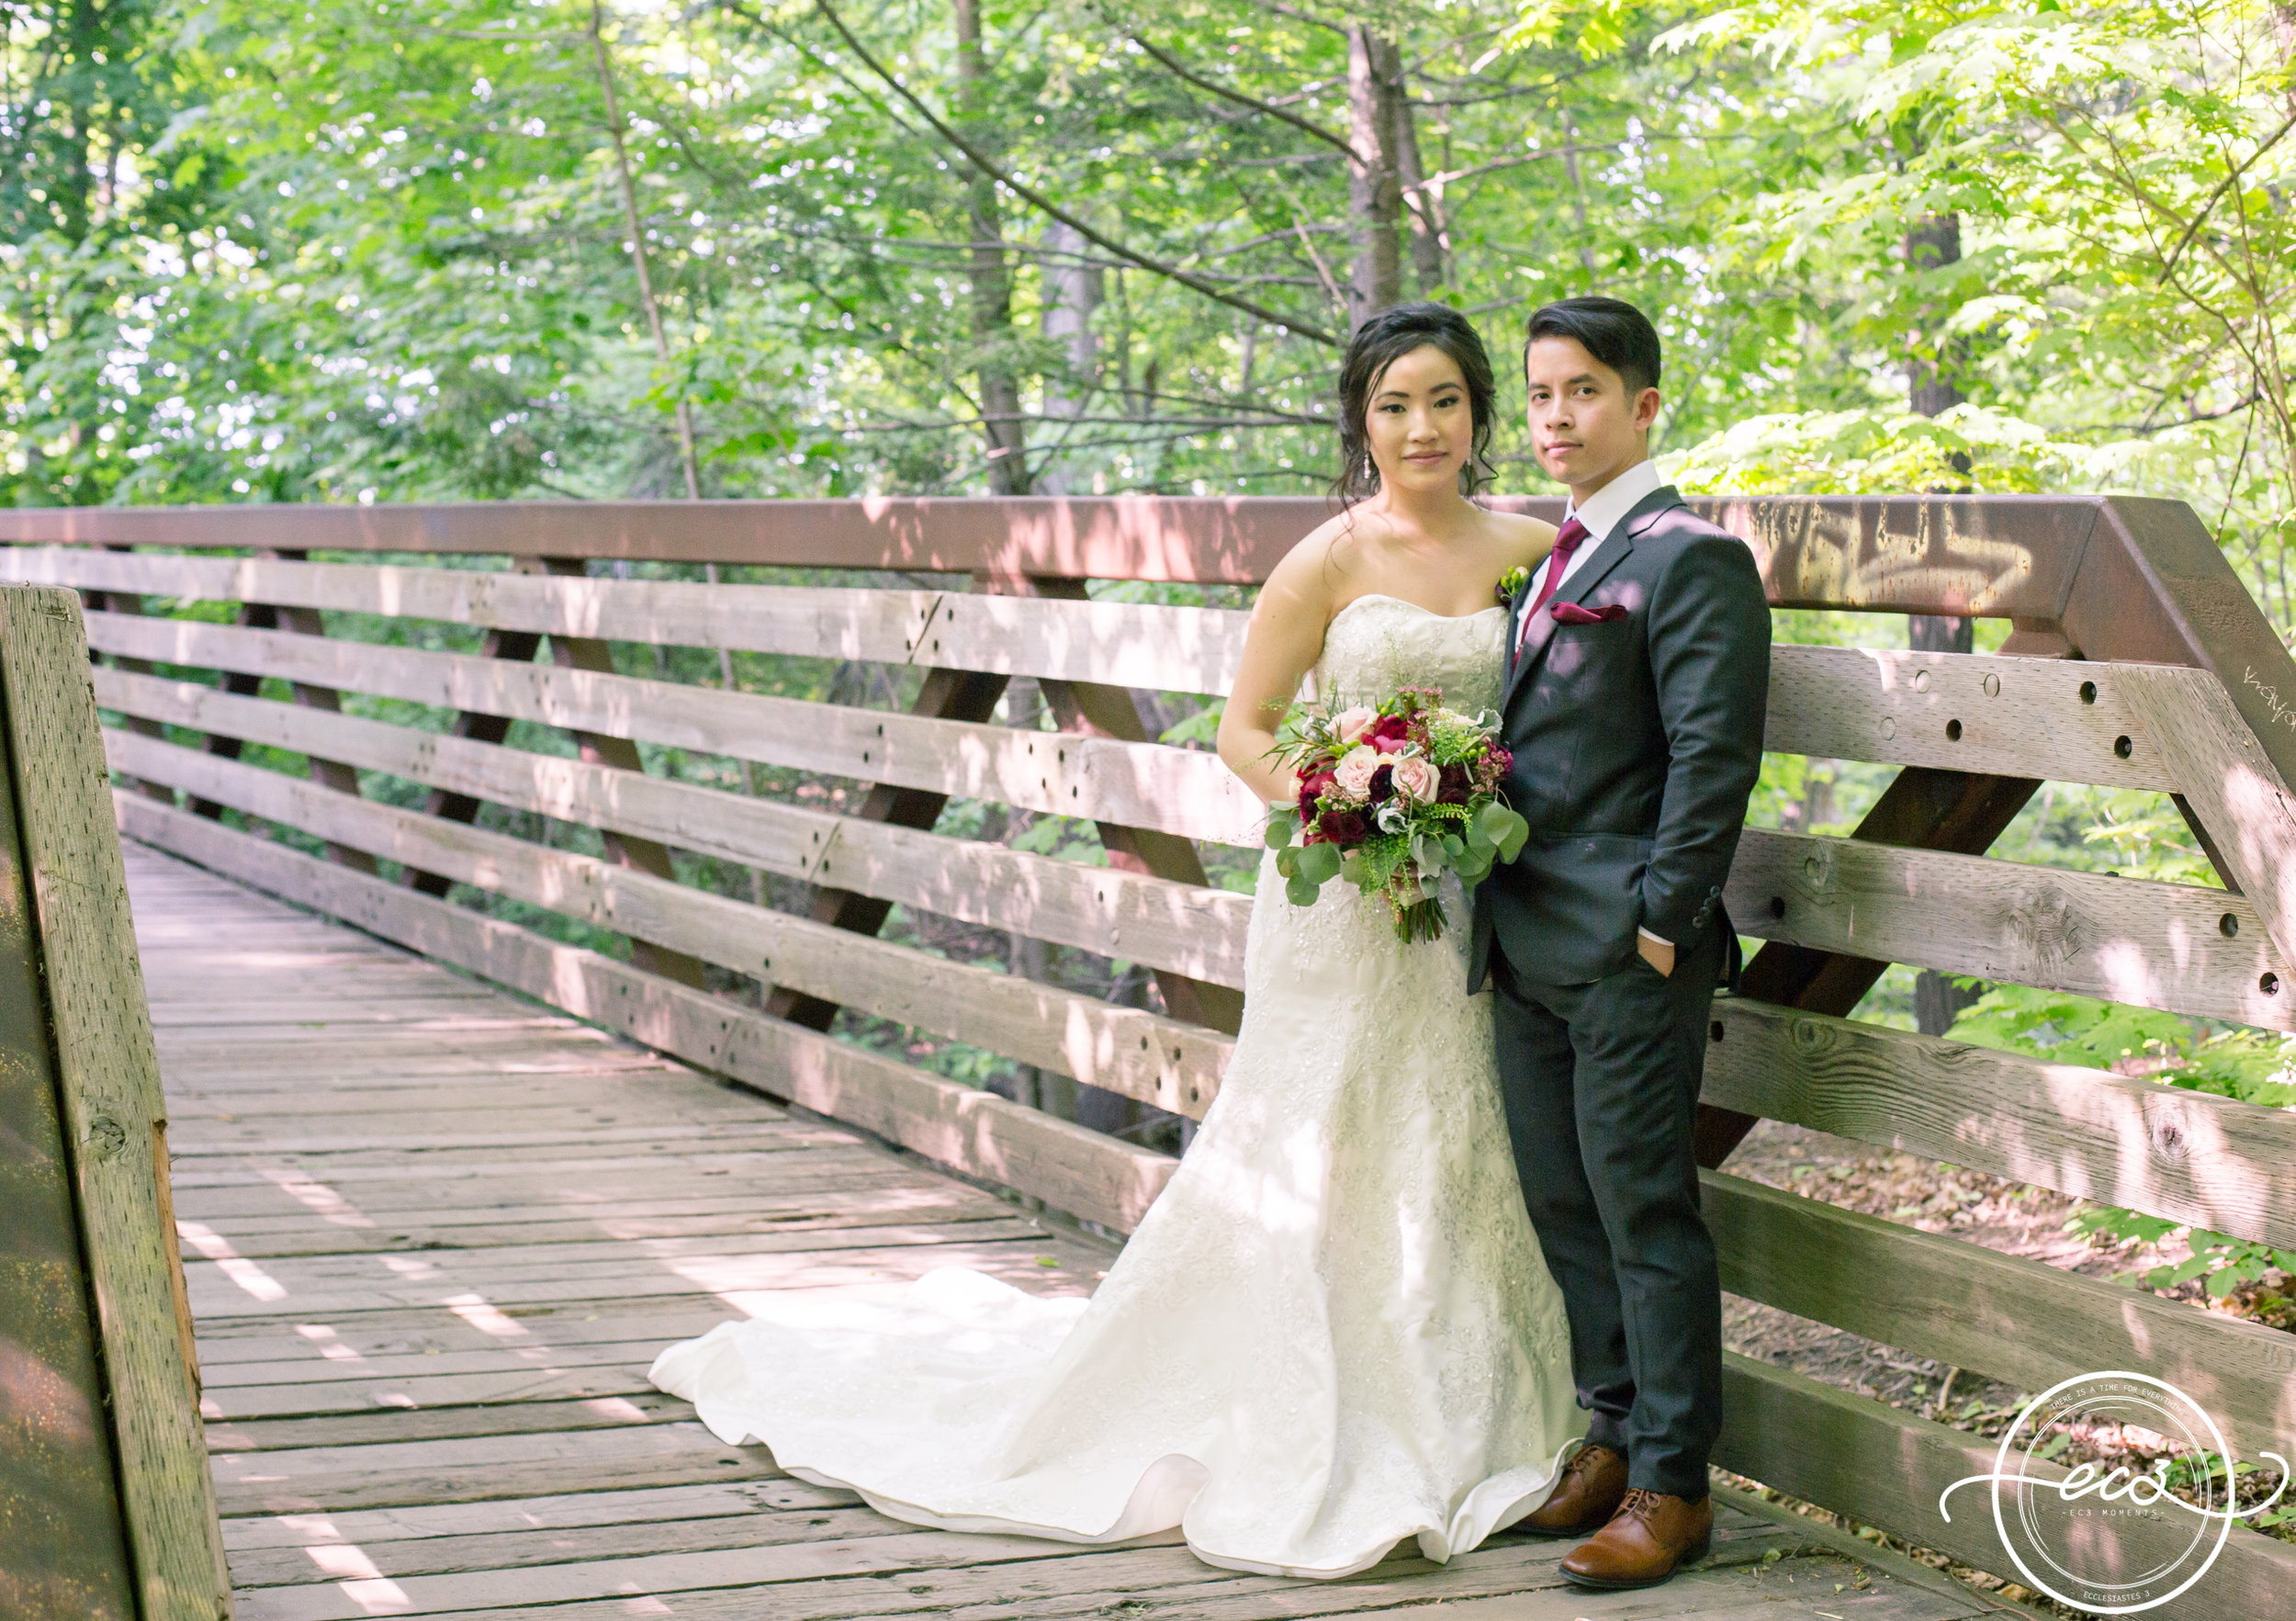 Toronto Edwards Garden and Intimate Vietnamese Wedding25.jpg